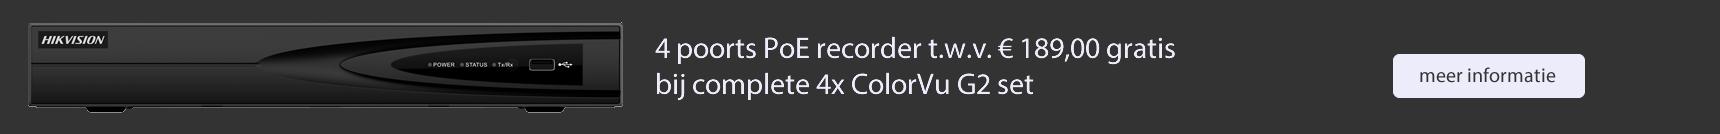 NVR Gratis bij ColorVu G2 set, 4 camera's